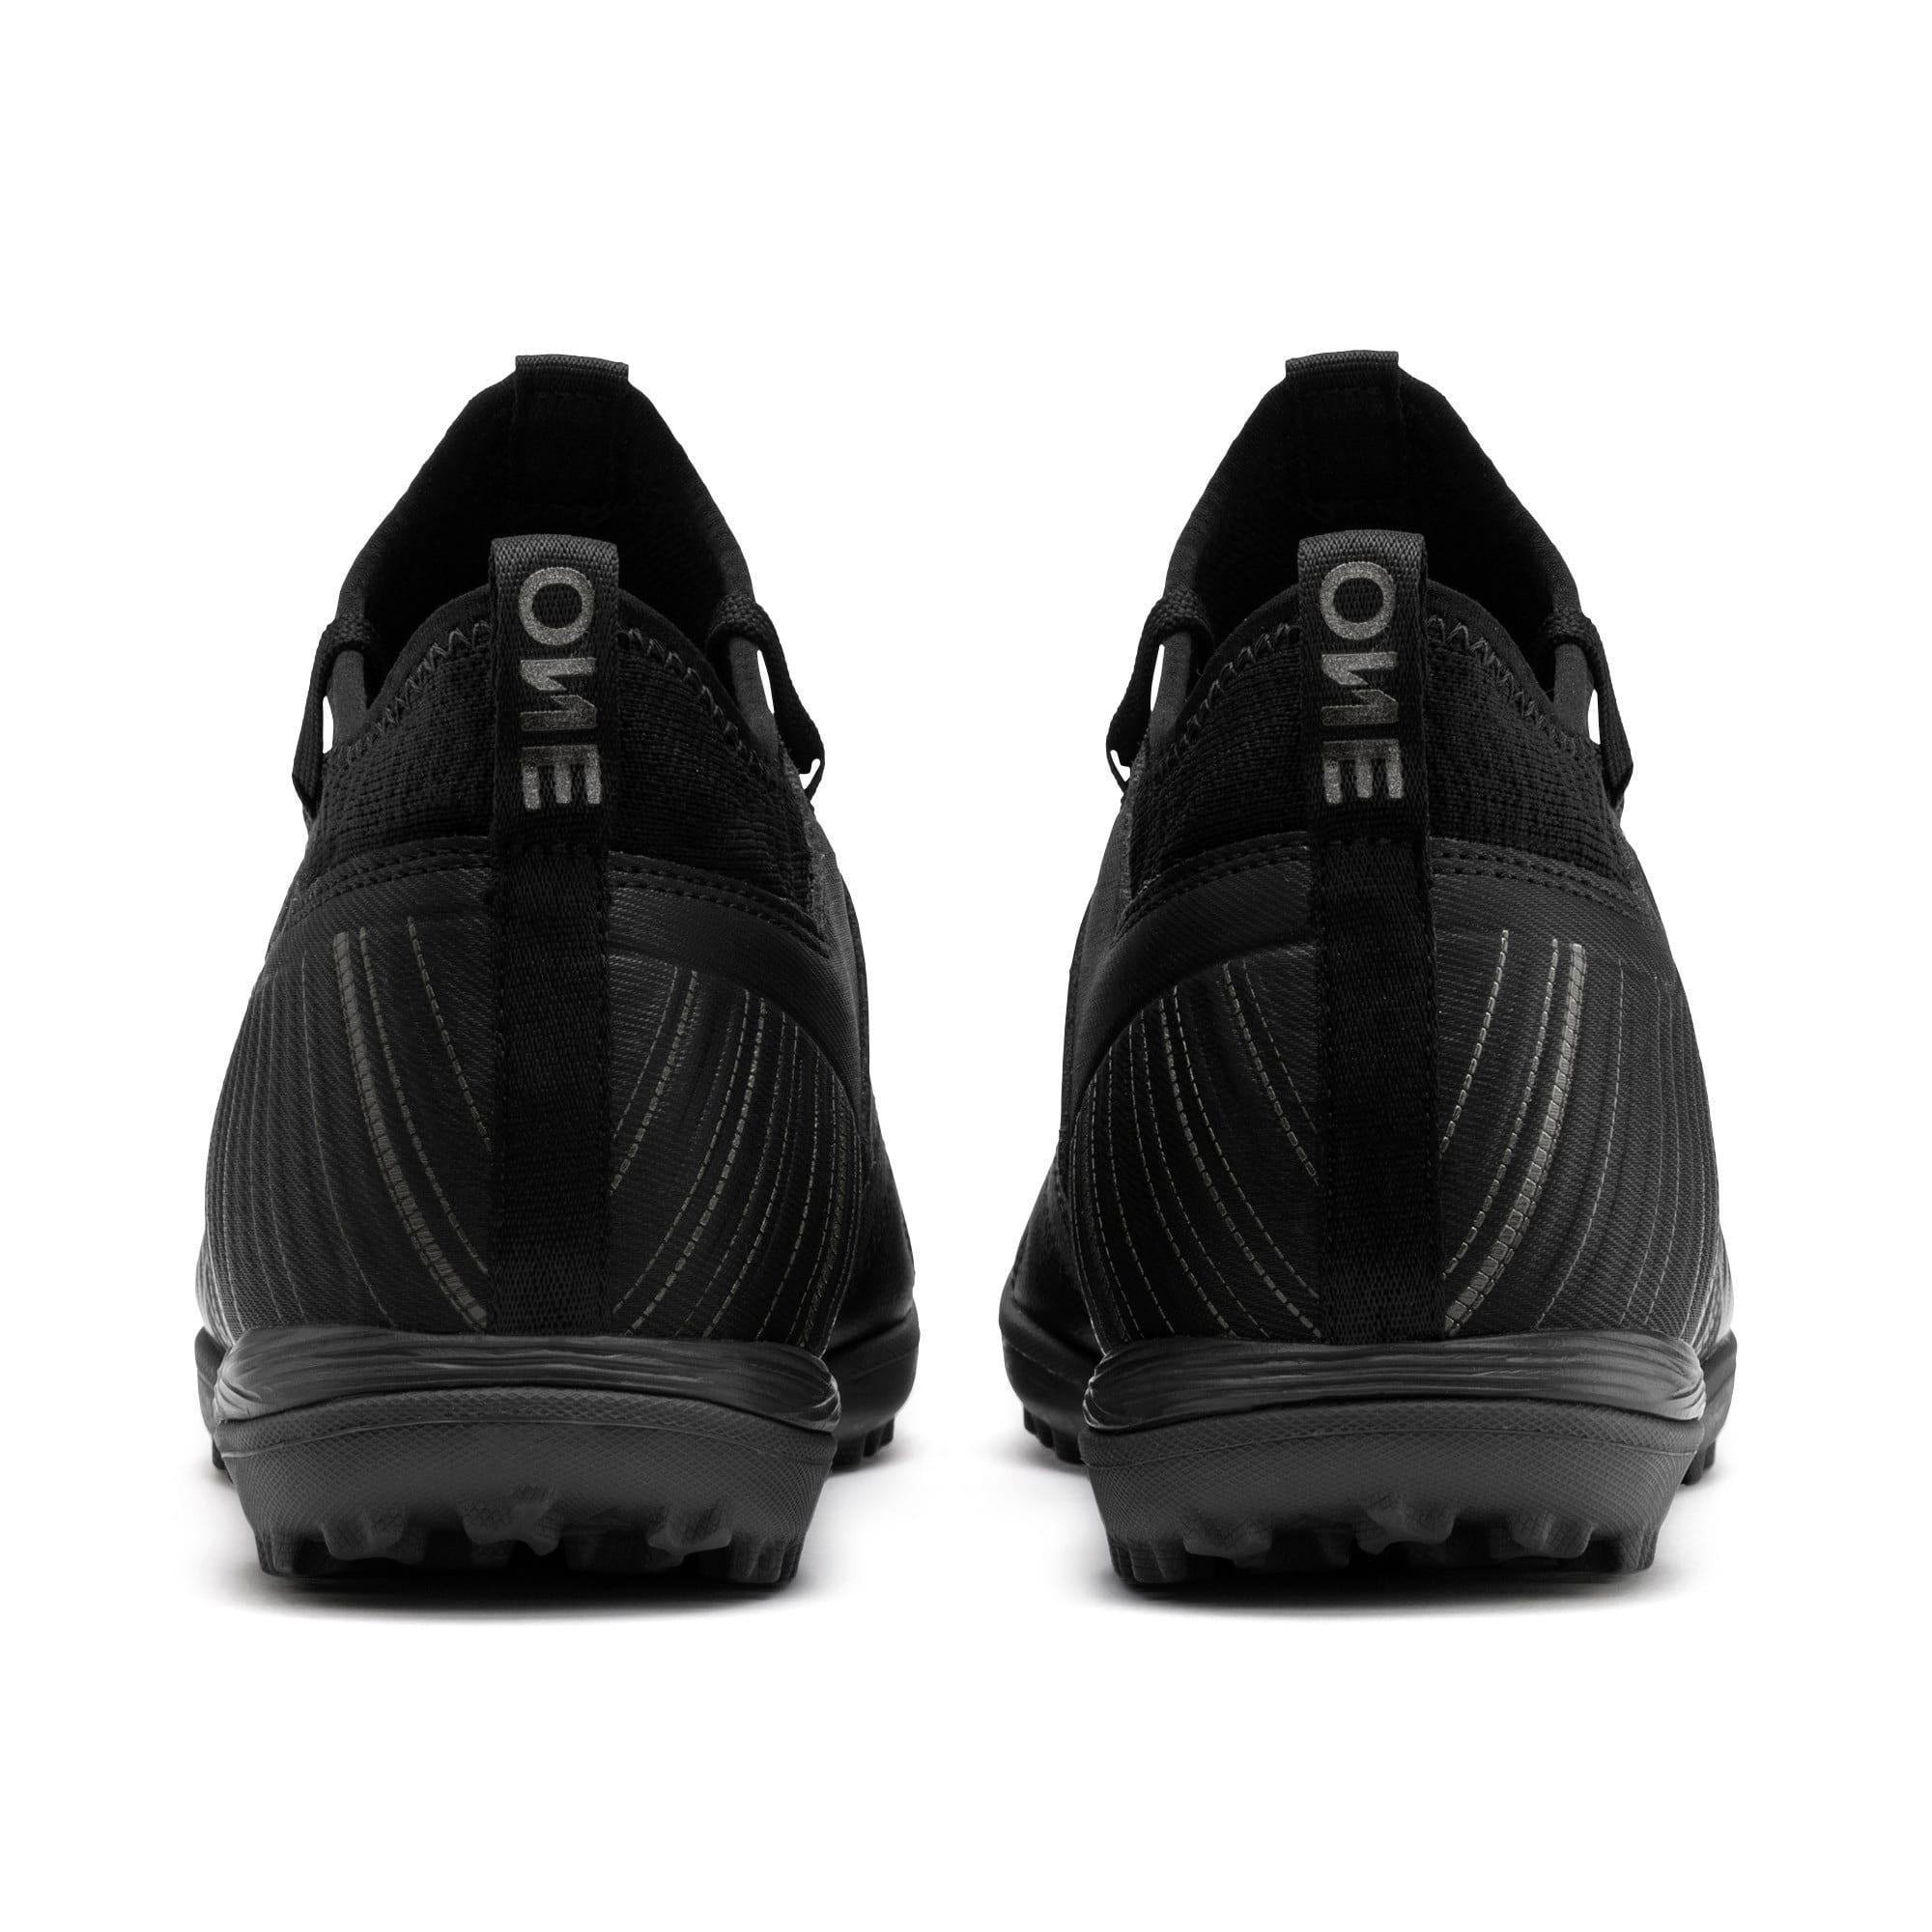 Thumbnail 4 of プーマ ワン 5.3 サッカー ターフトレーニング, Black-Black-Puma Aged Silver, medium-JPN